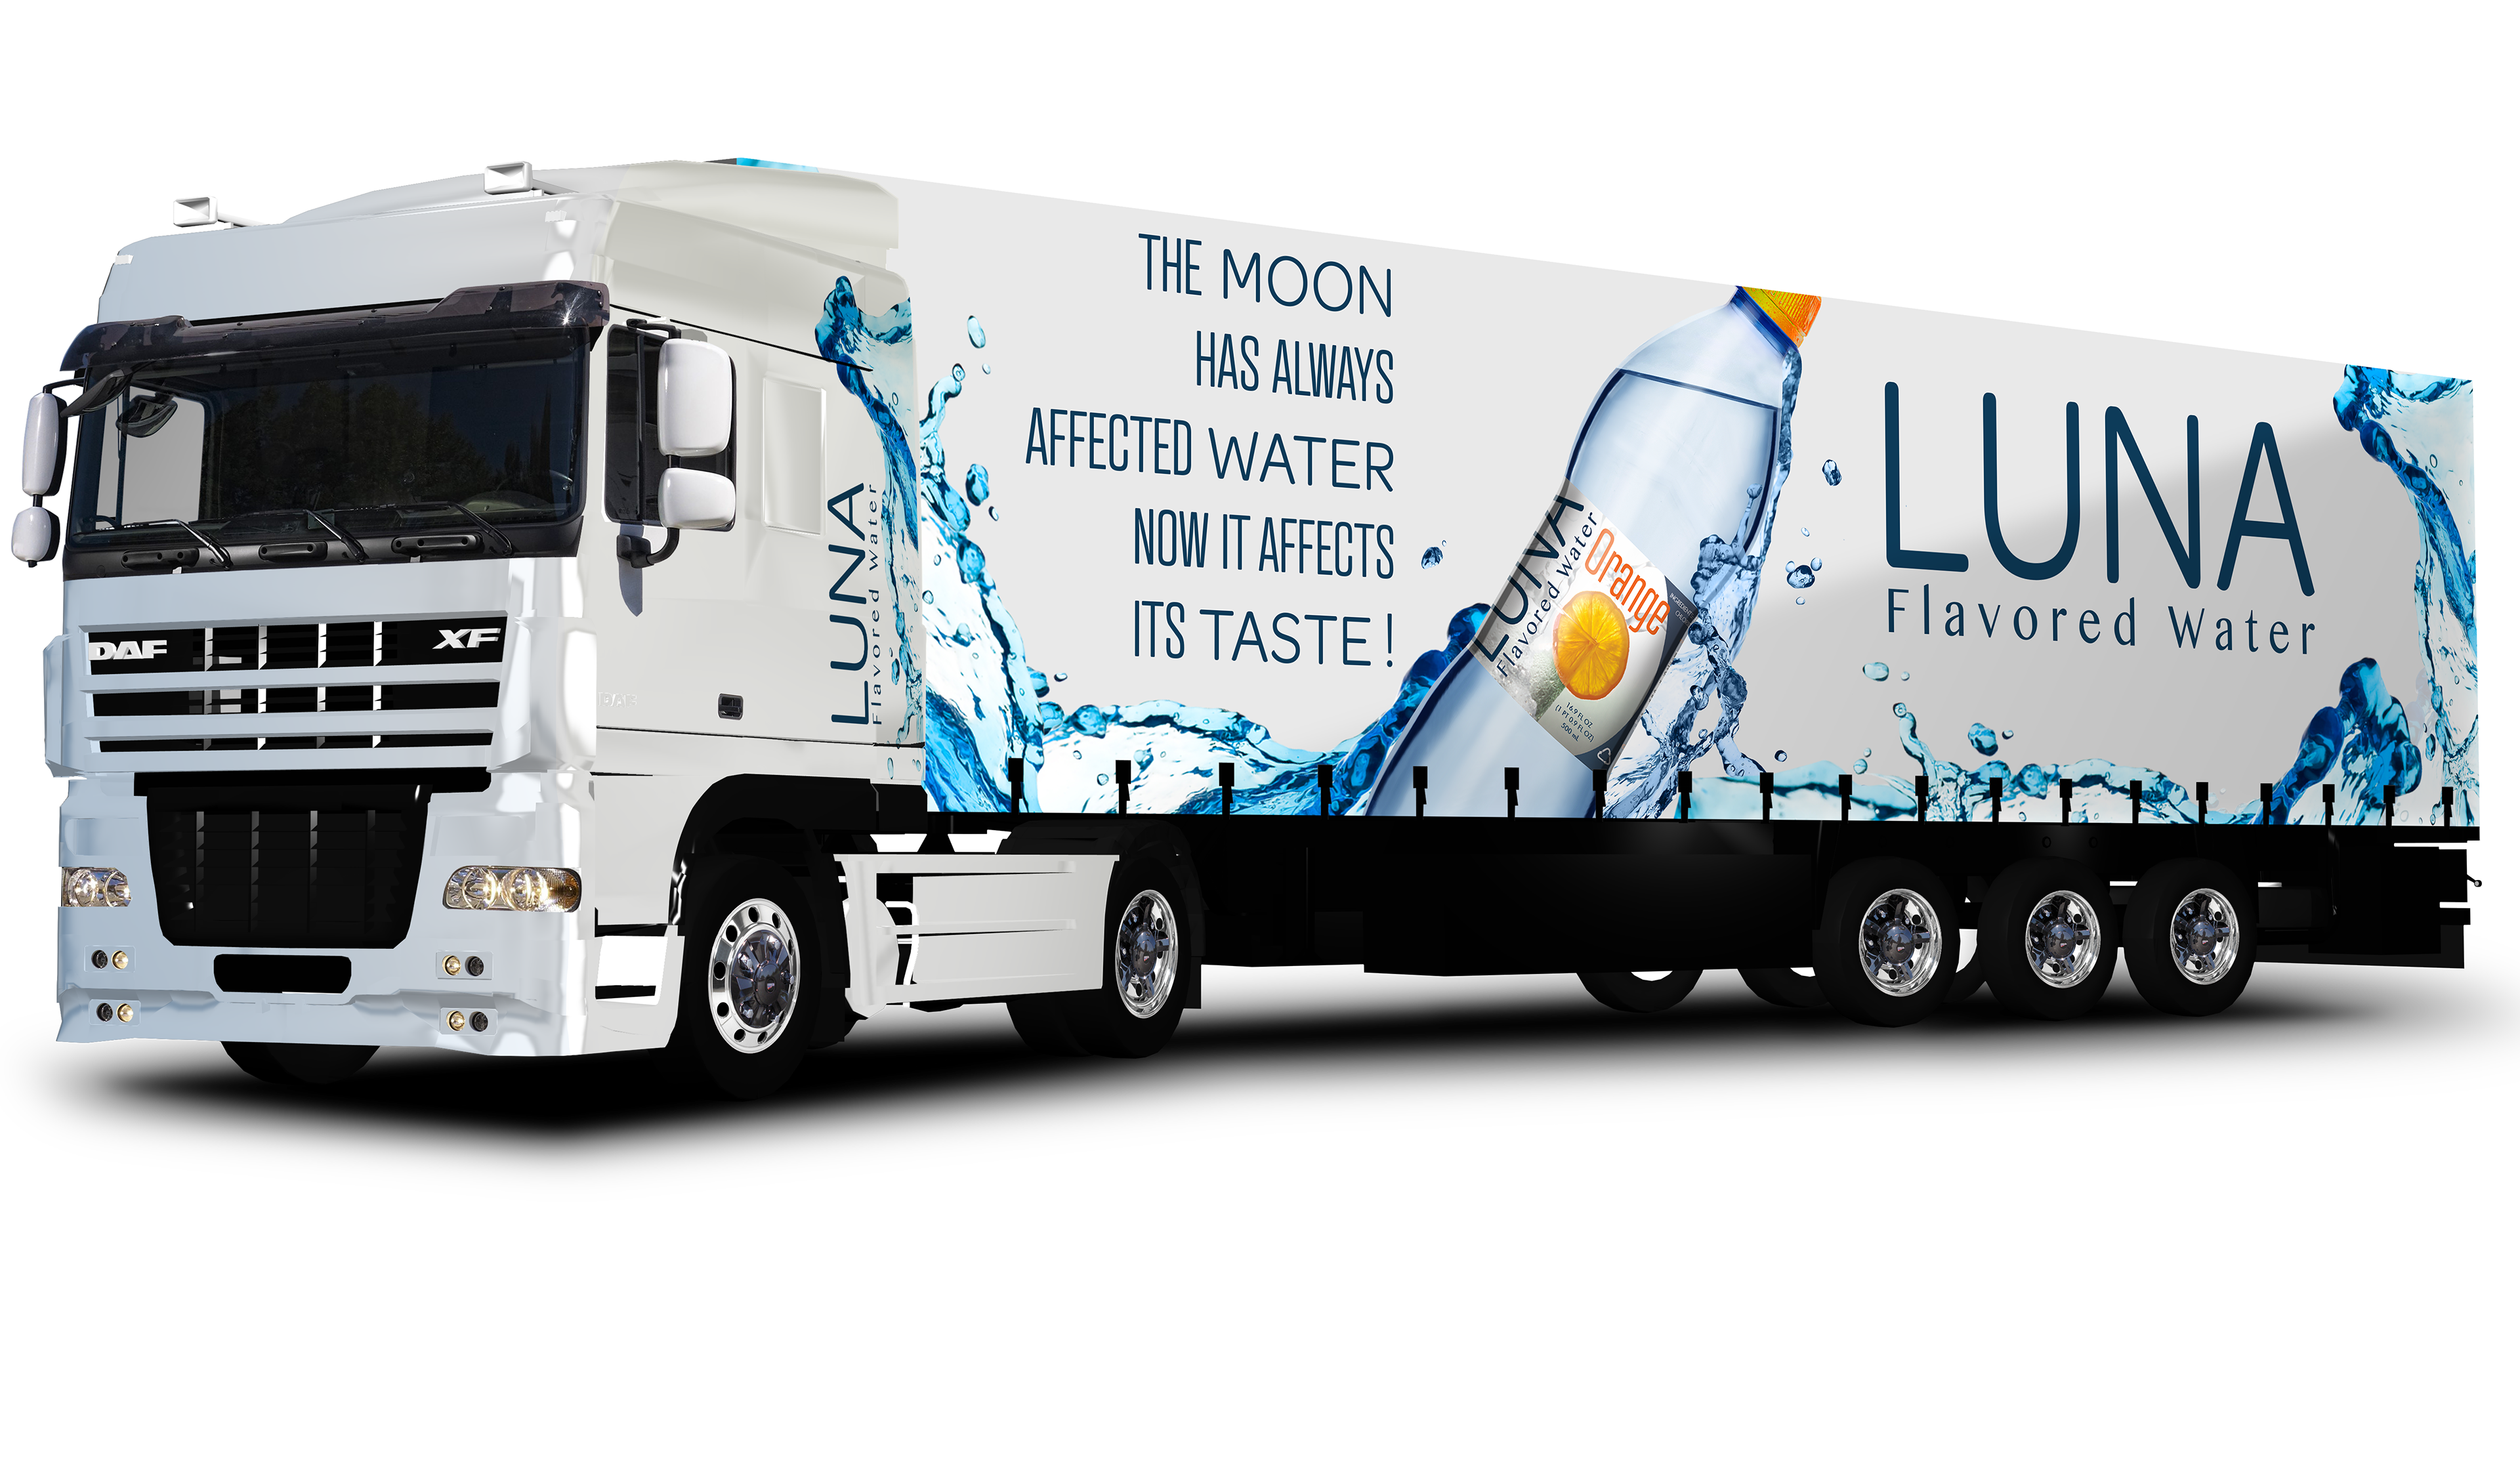 william winfield - Luna flavored water logo, branding ...